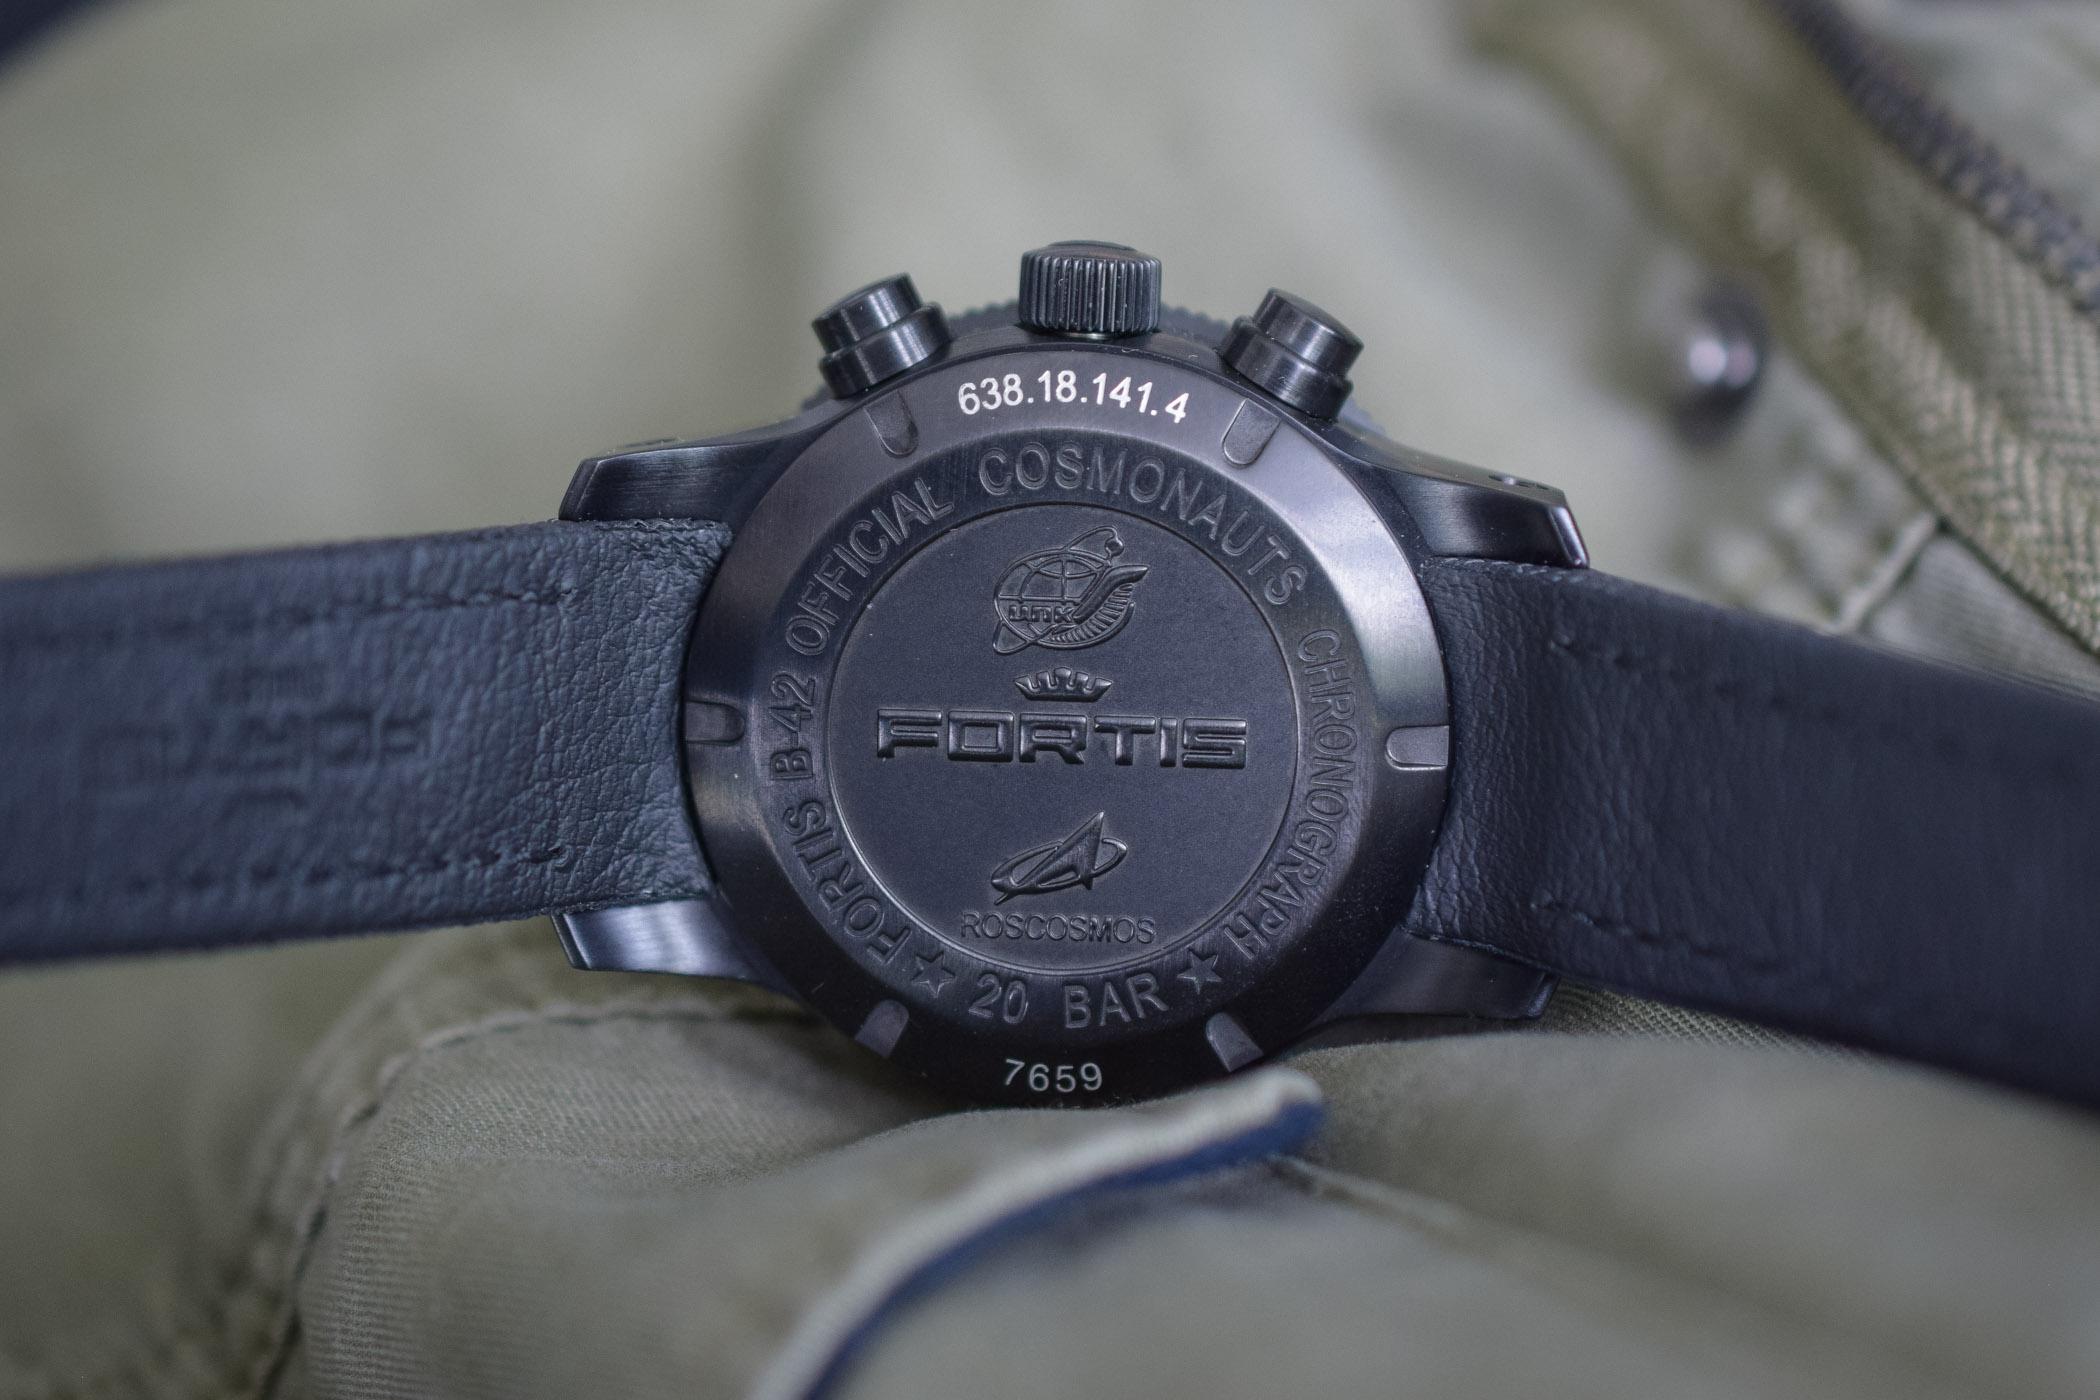 Fortis Aeromaster Mission Timer Chronograph